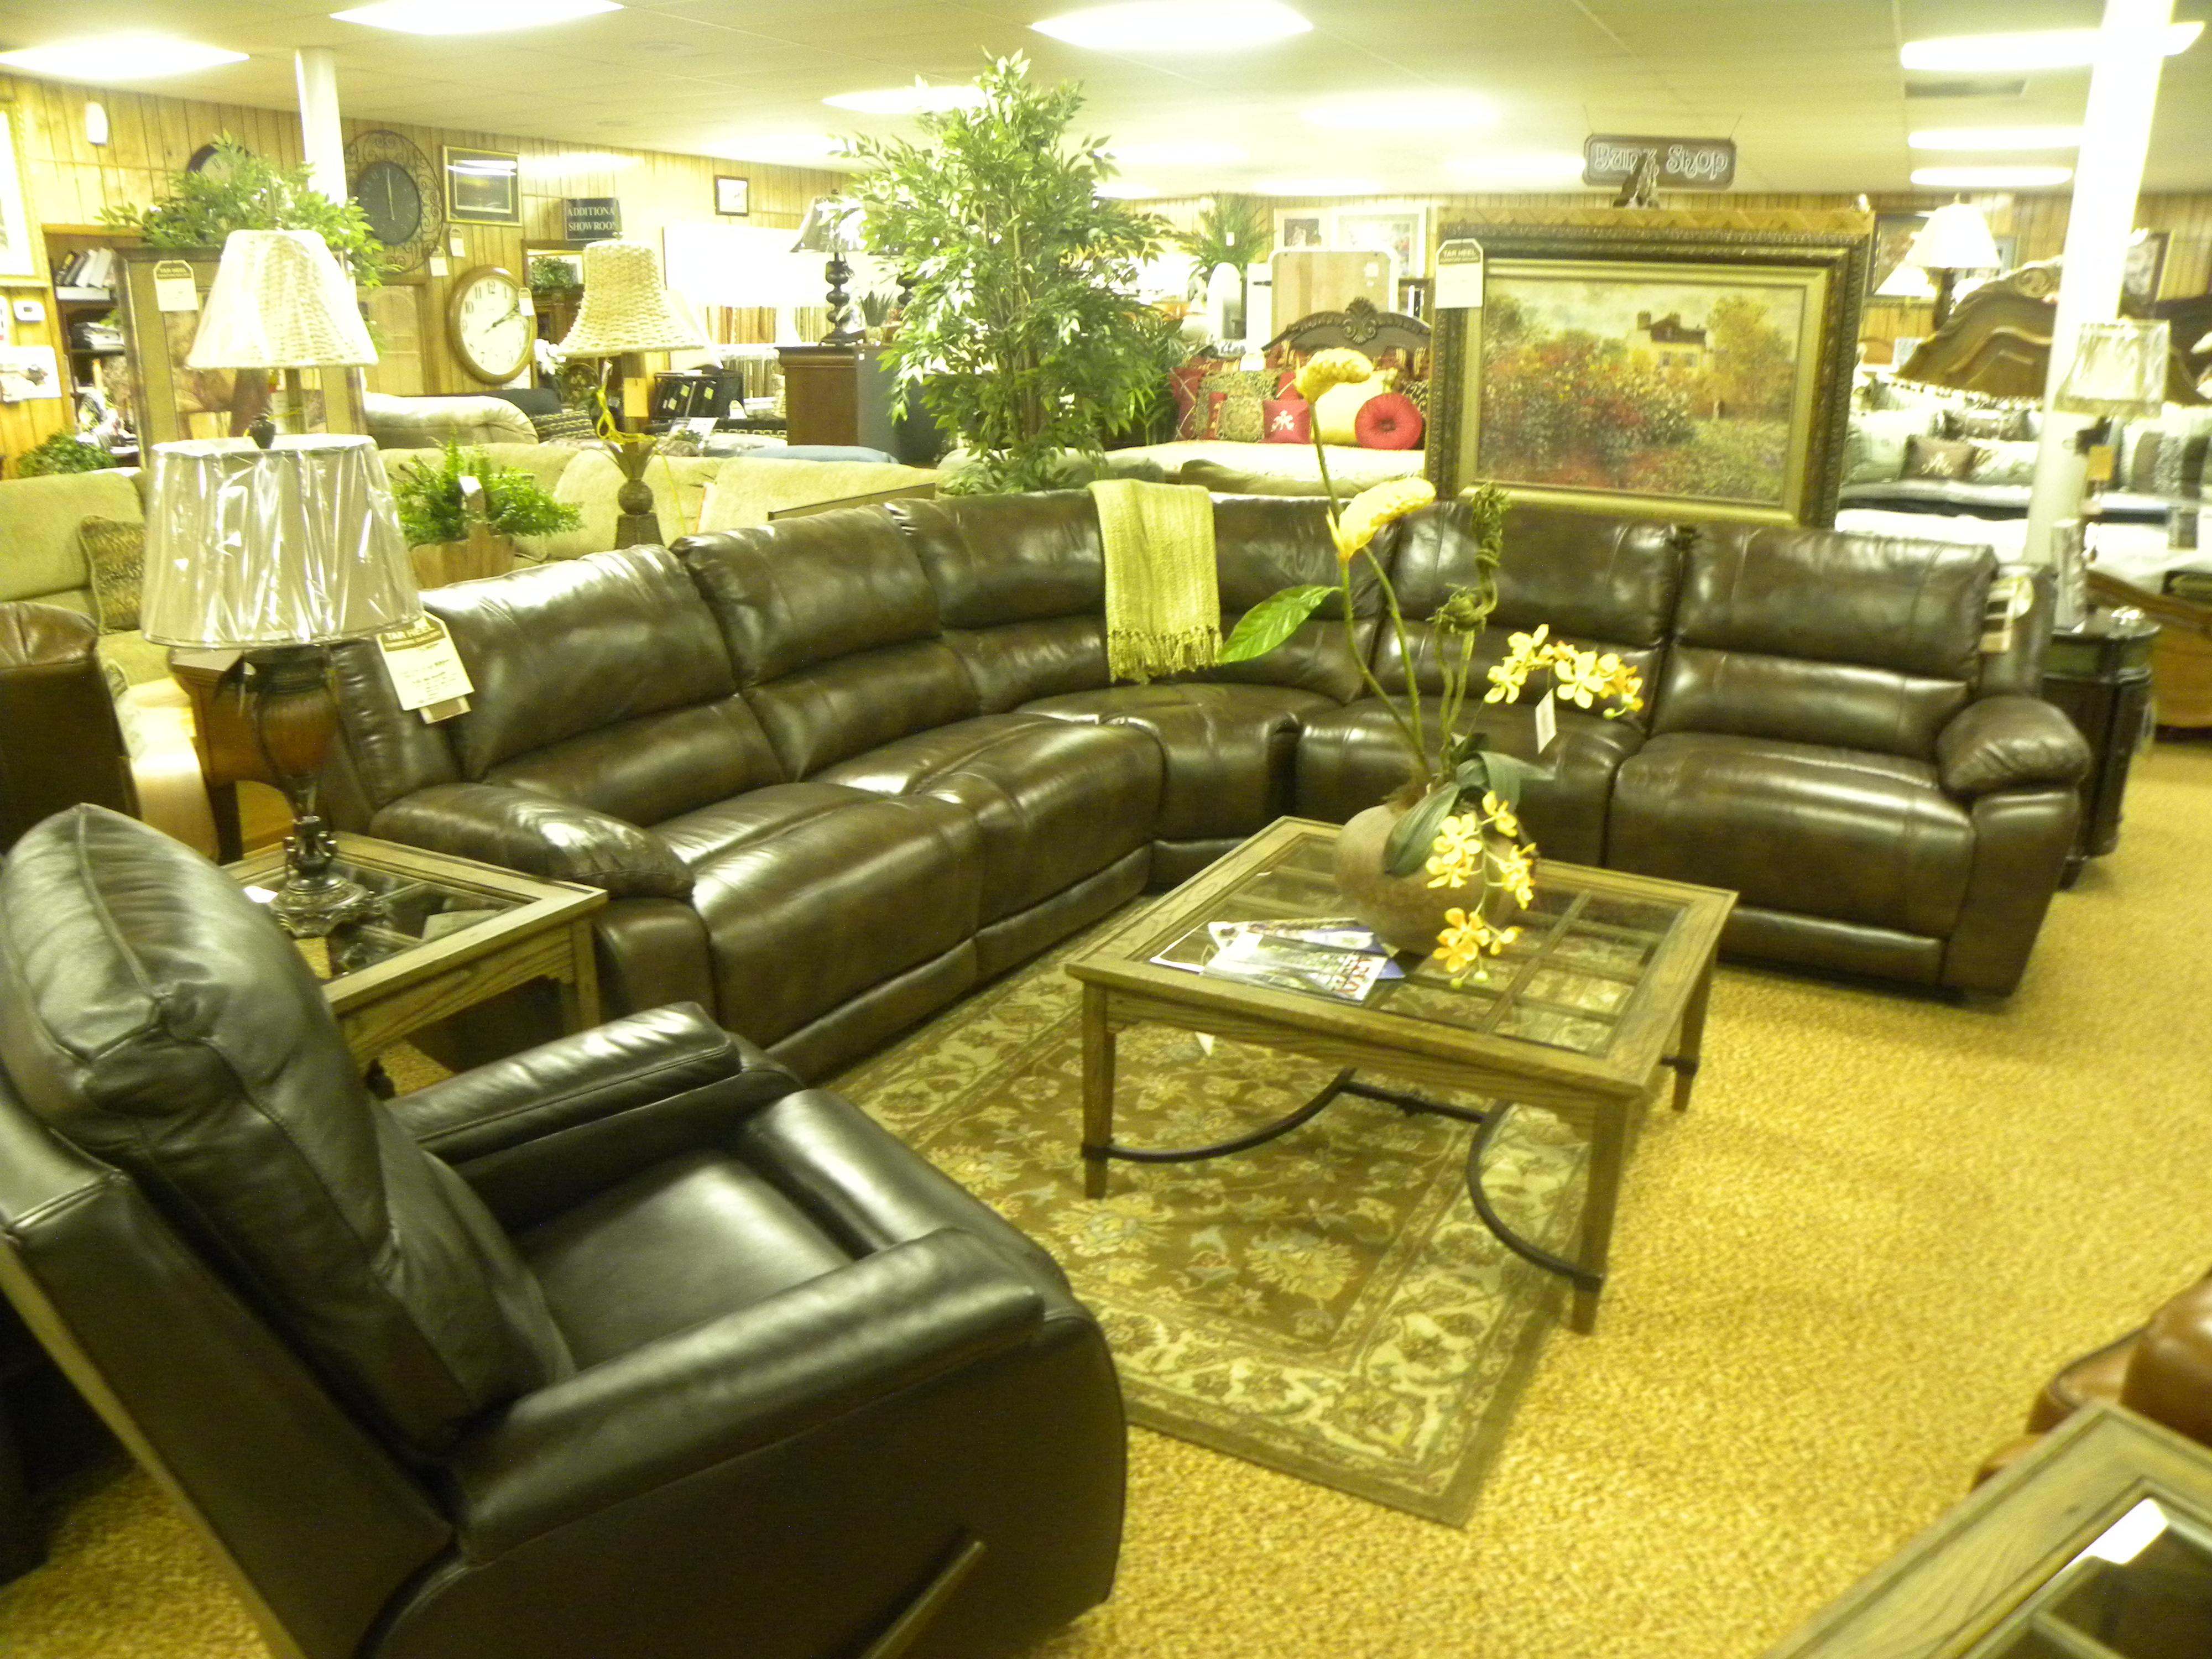 Tar Heel Furniture Gallery In Fayetteville Nc 28303